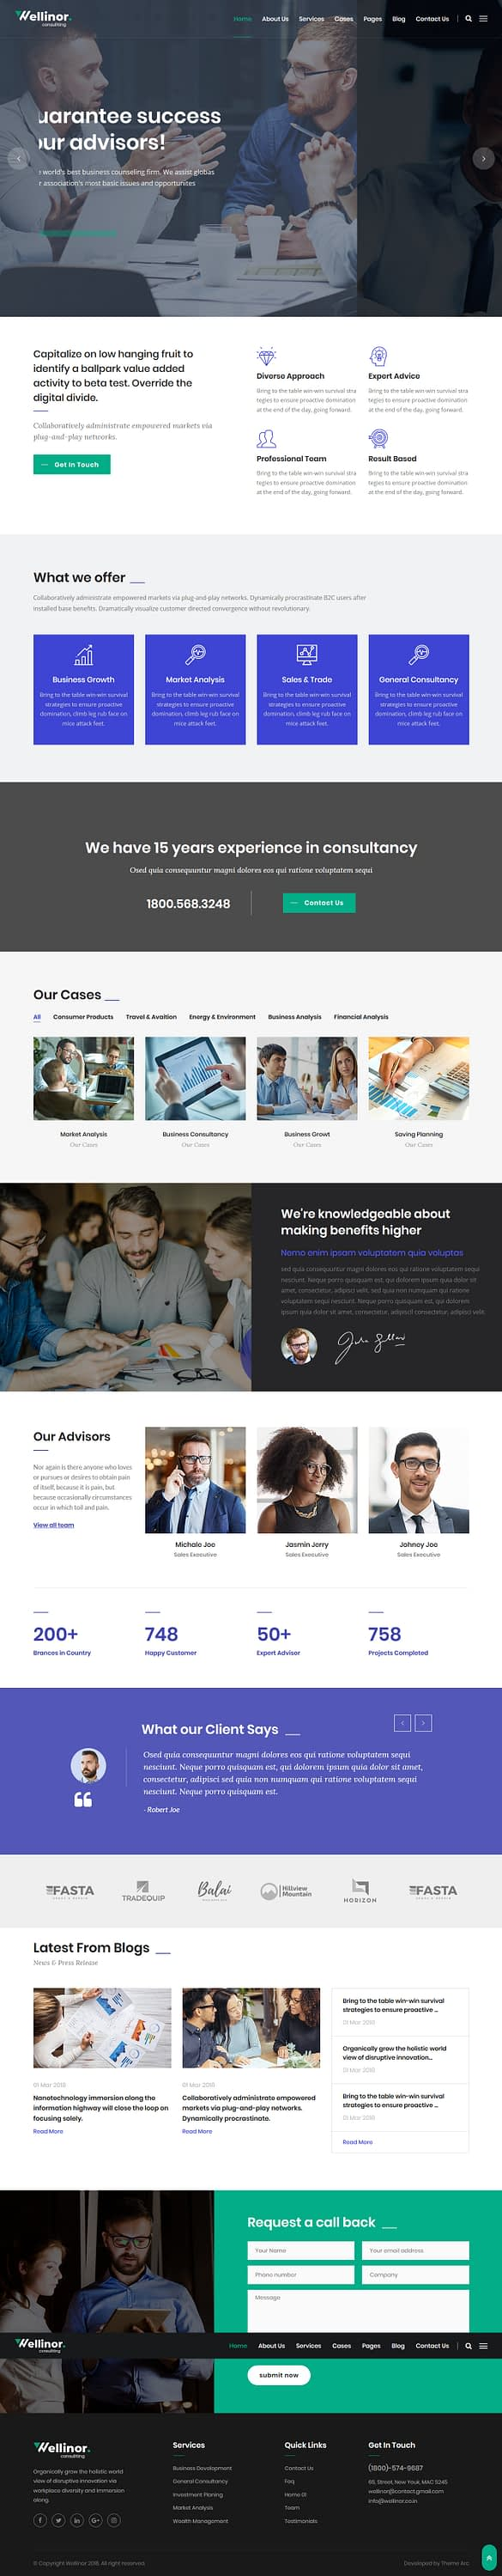 Wellinor - Best Premium Consulting WordPress Theme